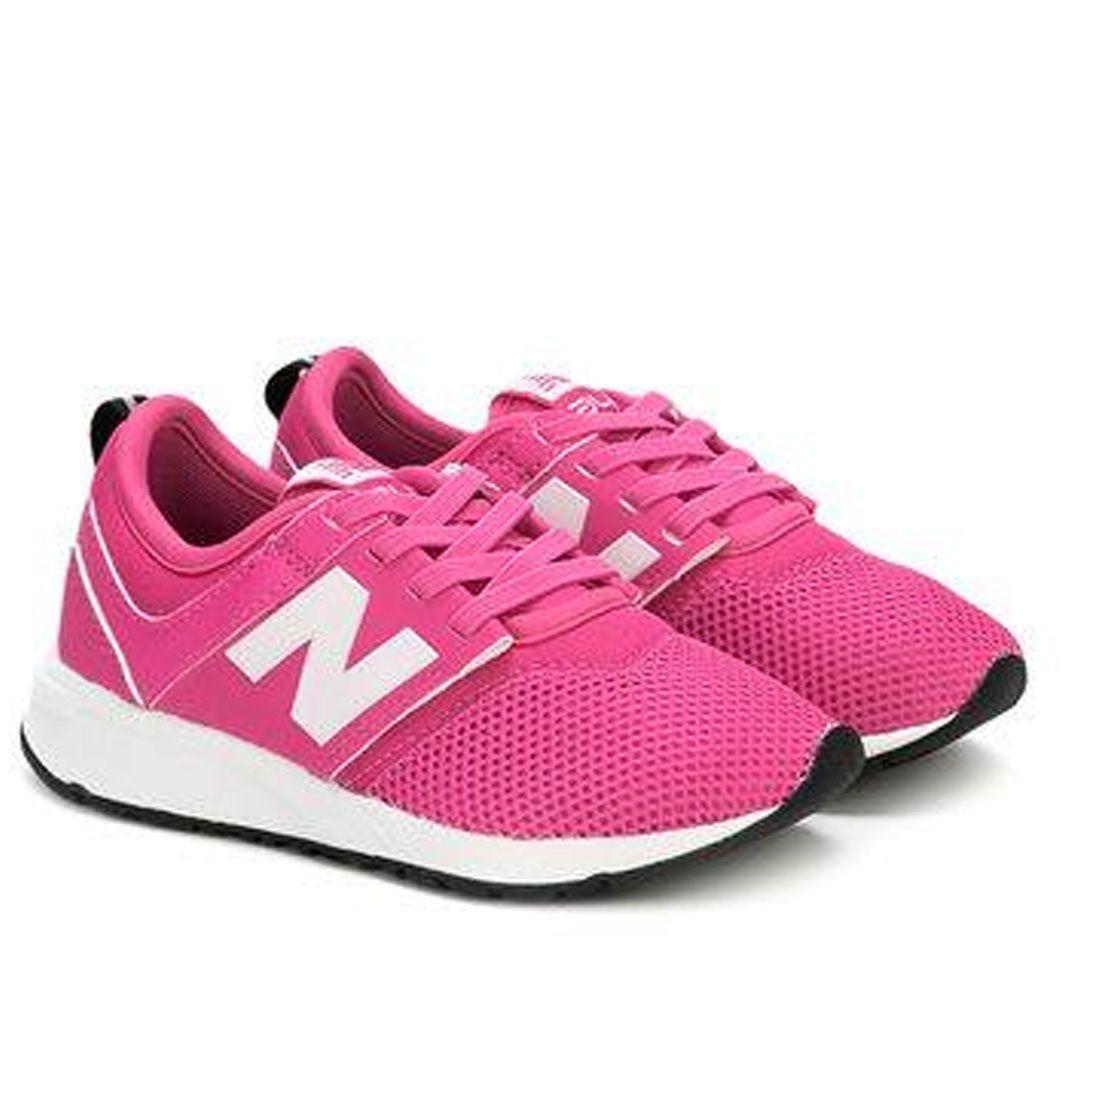 8d83ce08214 Tênis Infantil New Balance Children Girls 247 Rosa N.29